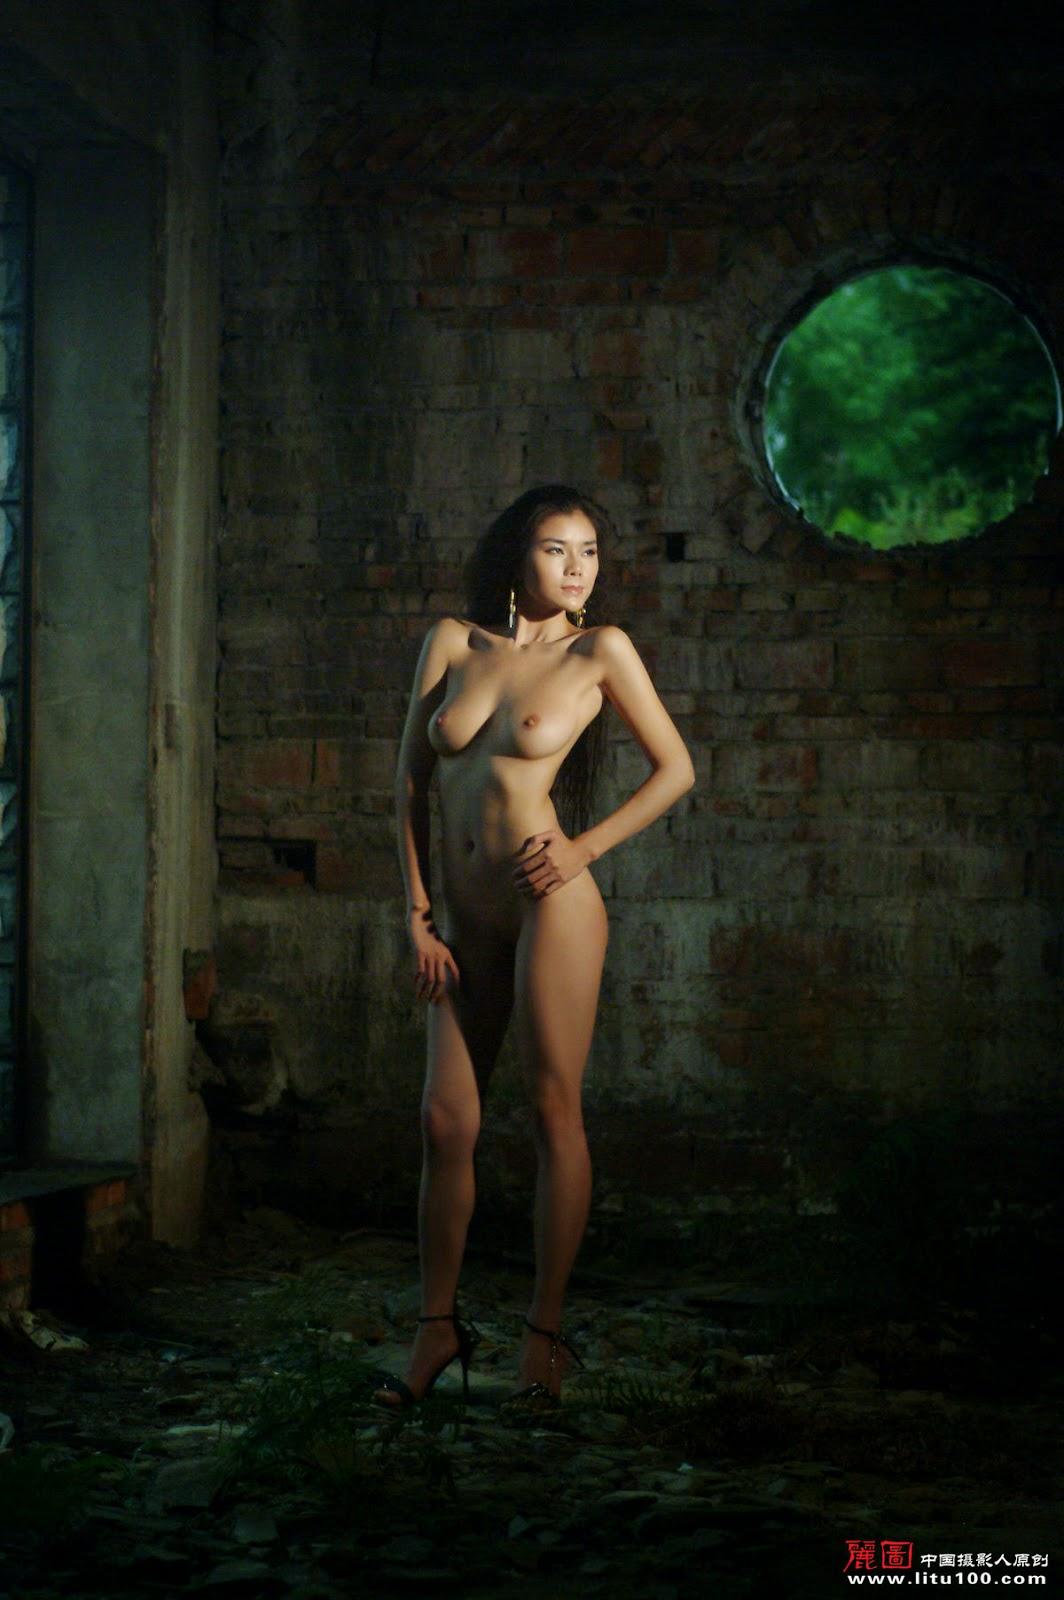 Gong li nude pussy penis girls panties amatuer